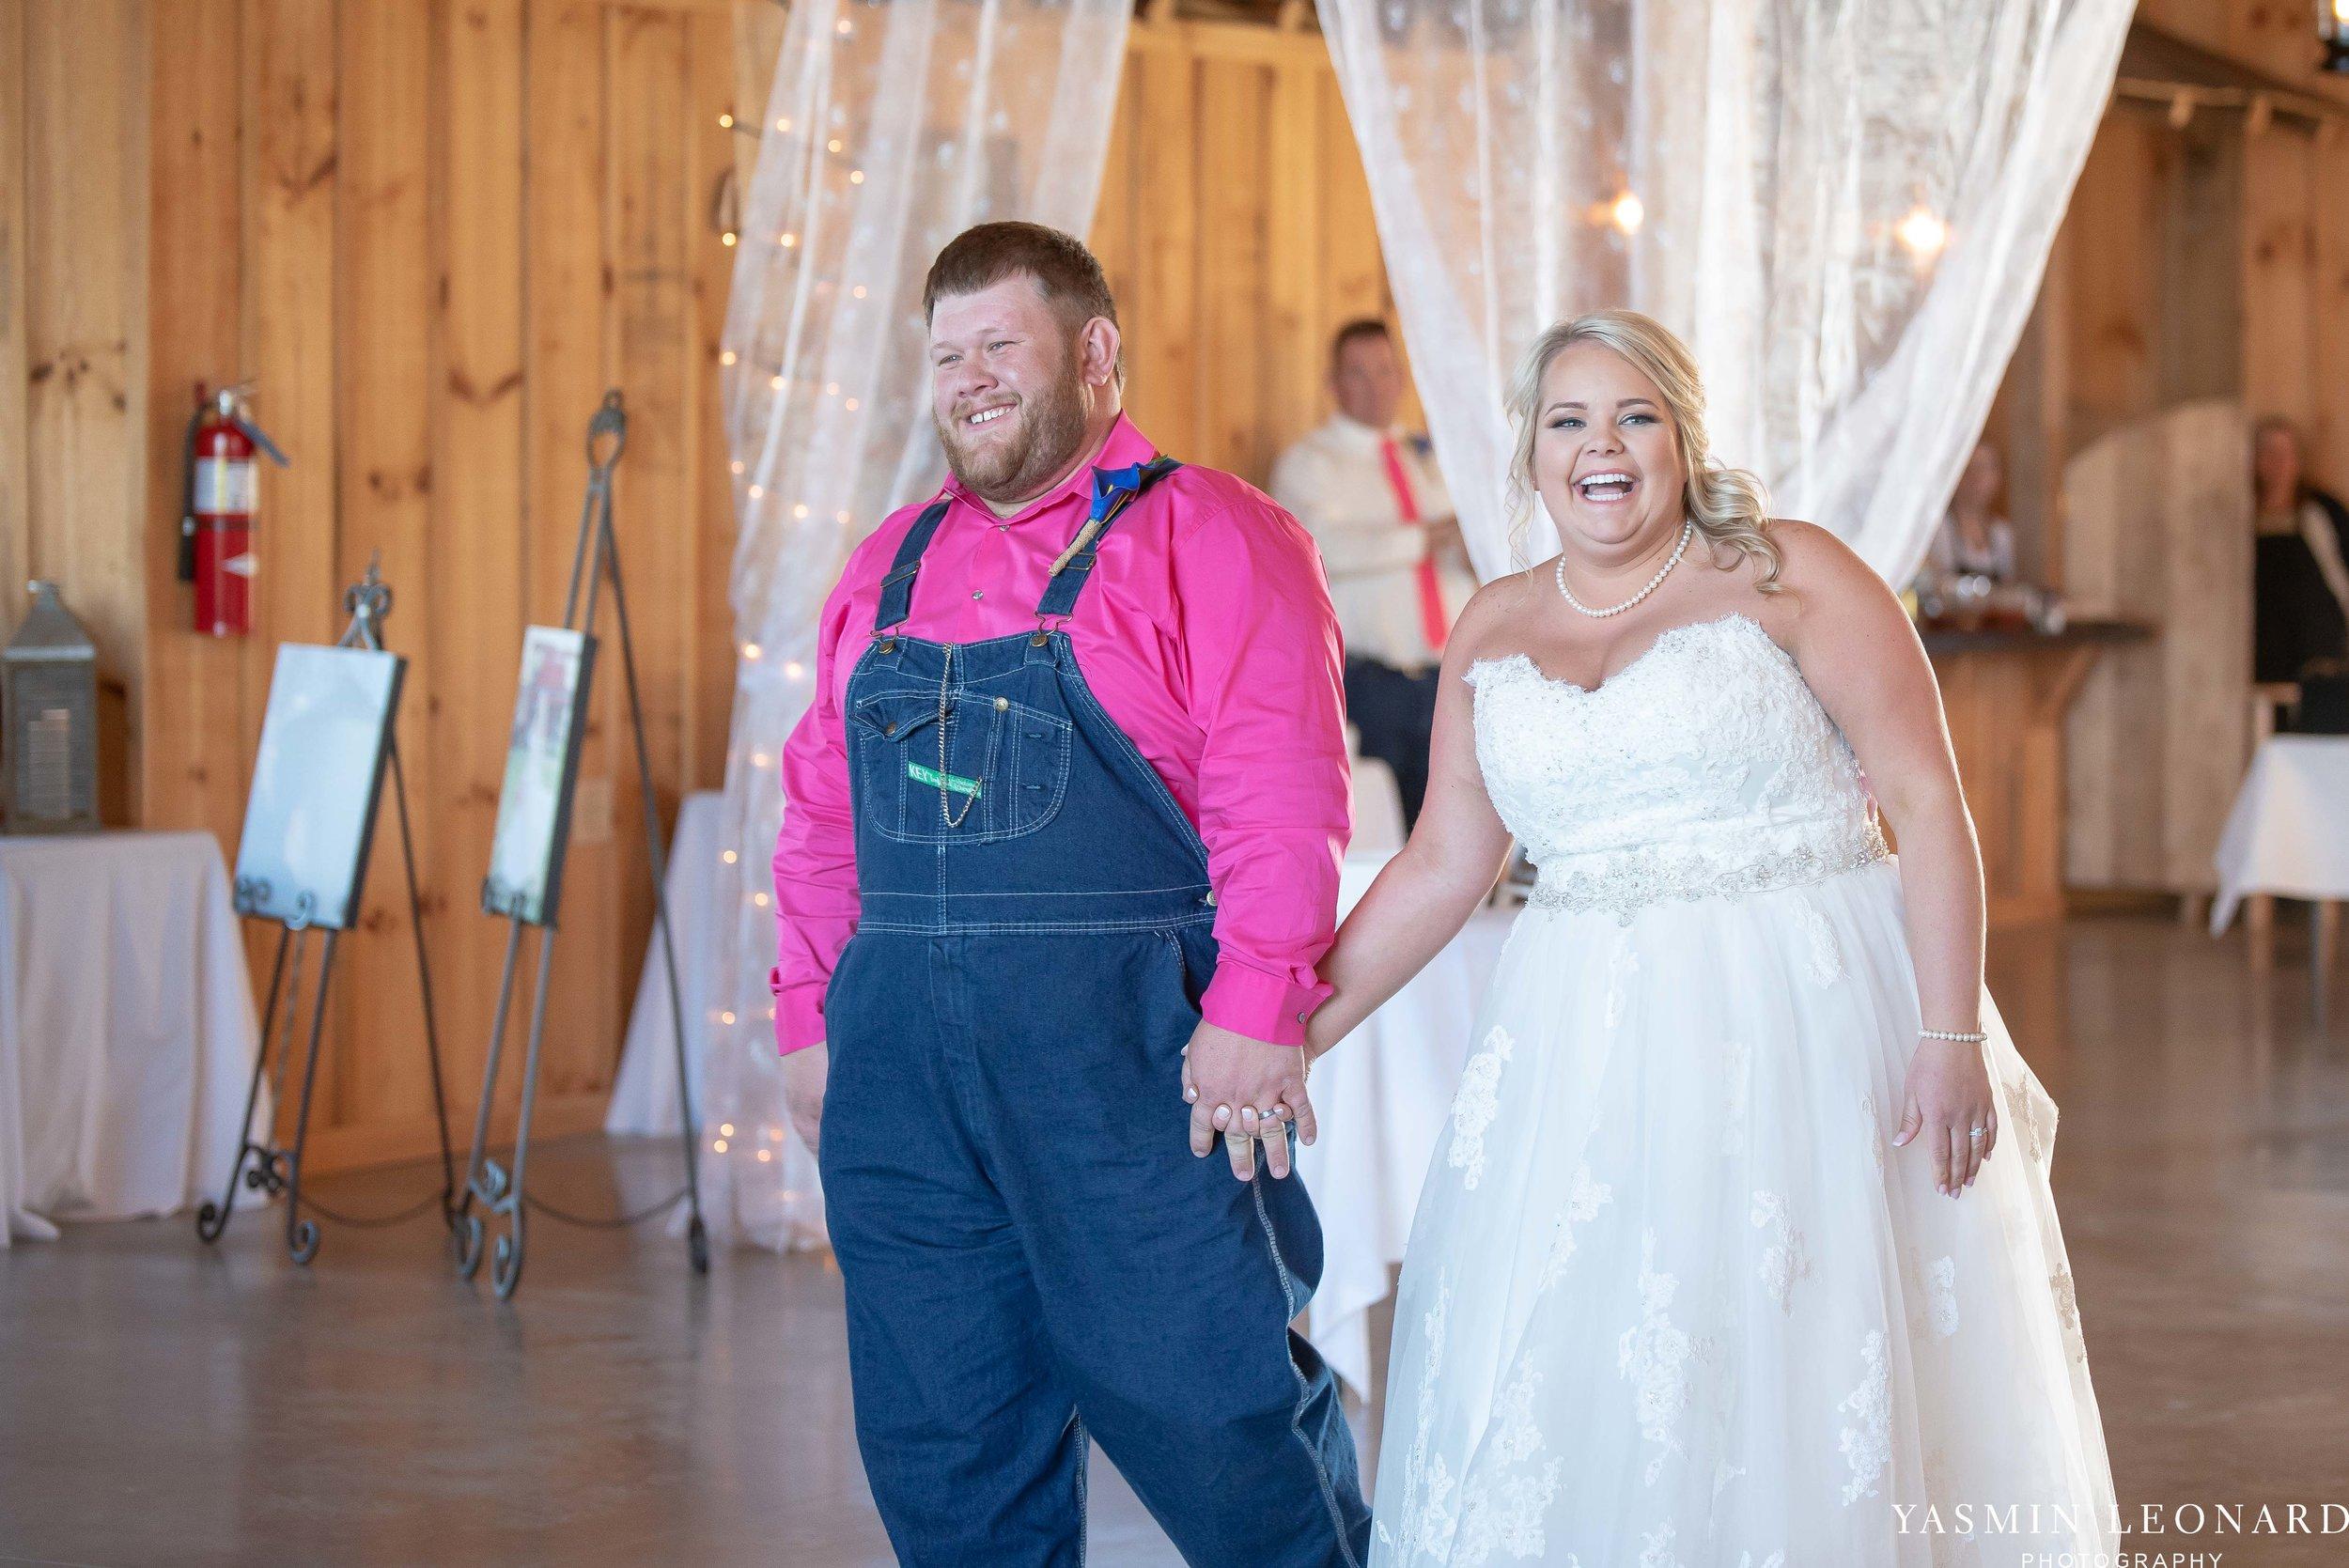 The Barn at Heritage Farm - Country Wedding - Pink and Blue Wedding - Barn Wedding - Outdoor Wedding - Cotton and Wheat Decor - Groom in Bibs - Pink Bridal Colors - Yasmin Leonard Photography-23.jpg